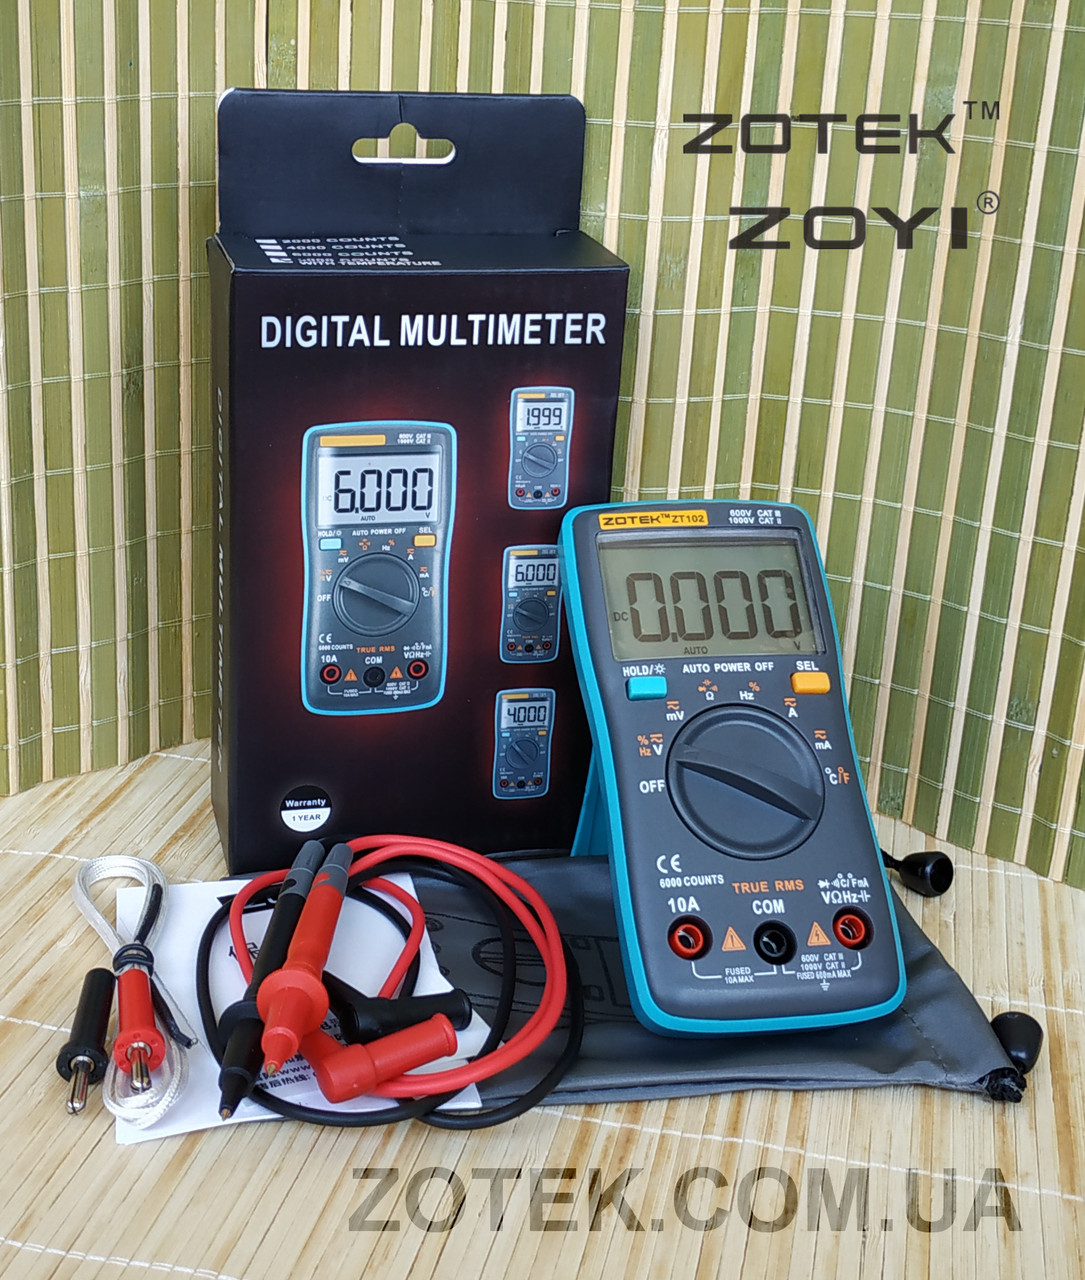 Мультиметр ZOTEK ZT102 цифровой тестер с термопарой True RMS